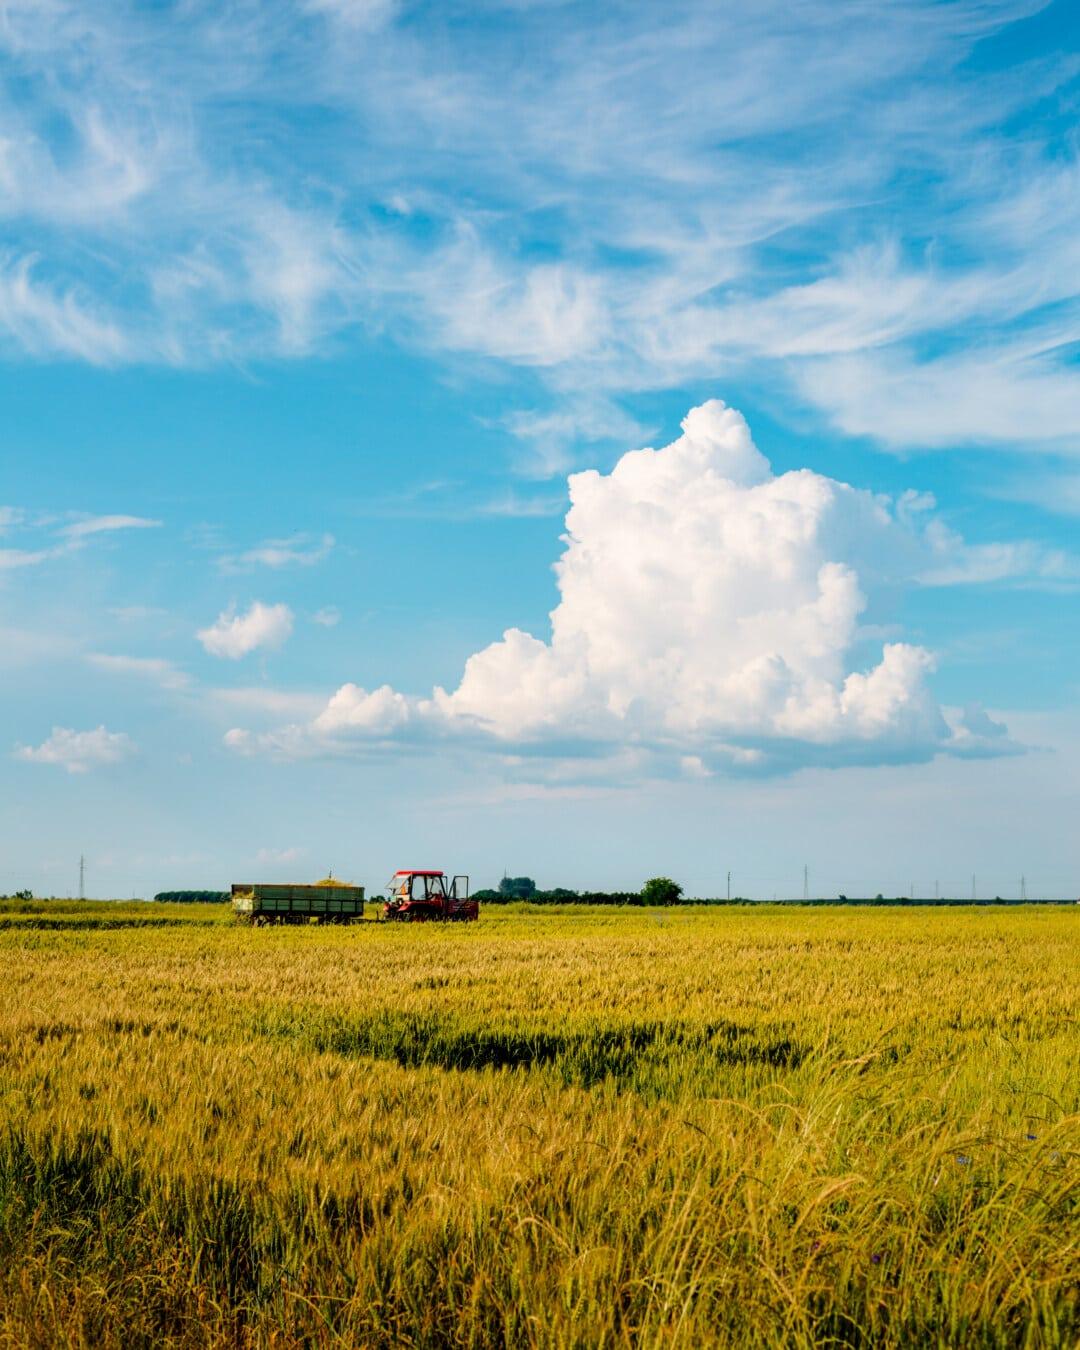 Trailer, traktor, pertanian, kerja lapangan, pemandangan, pedesaan, Brassica napus, pertanian, bidang, gandum